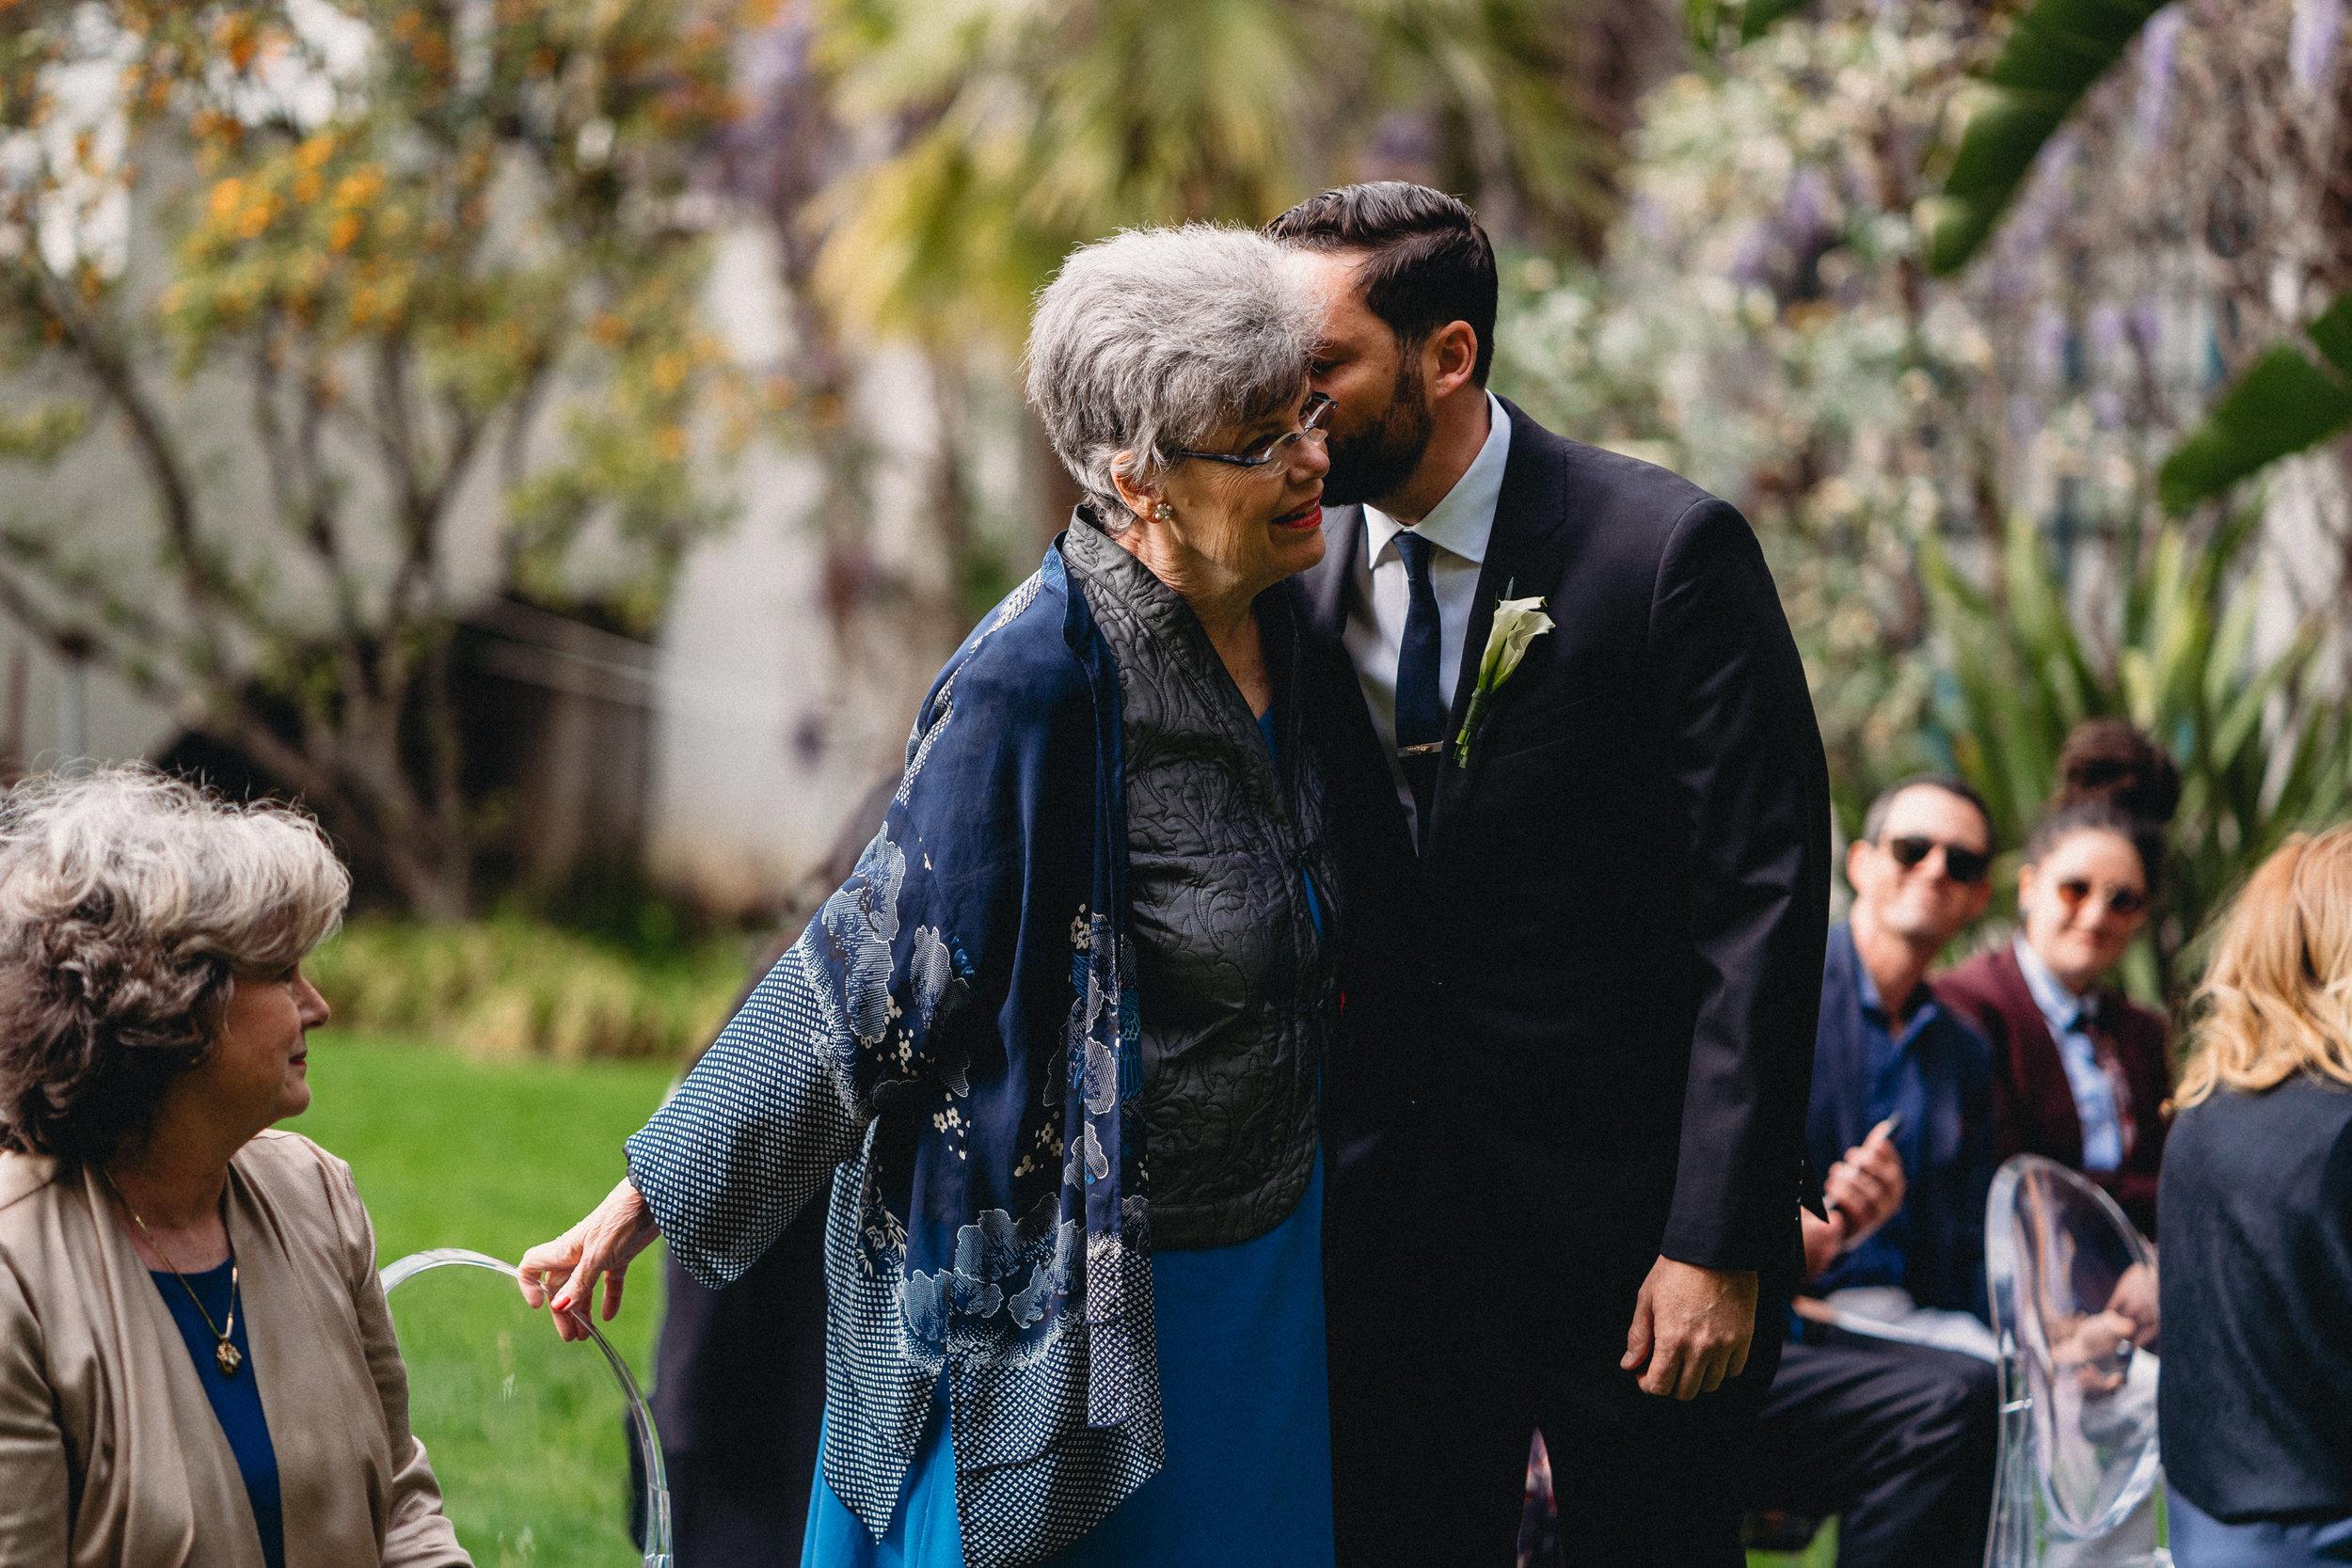 wedding-photography-santa-barbara-courthouse-rebeccaylasotras-36.jpg